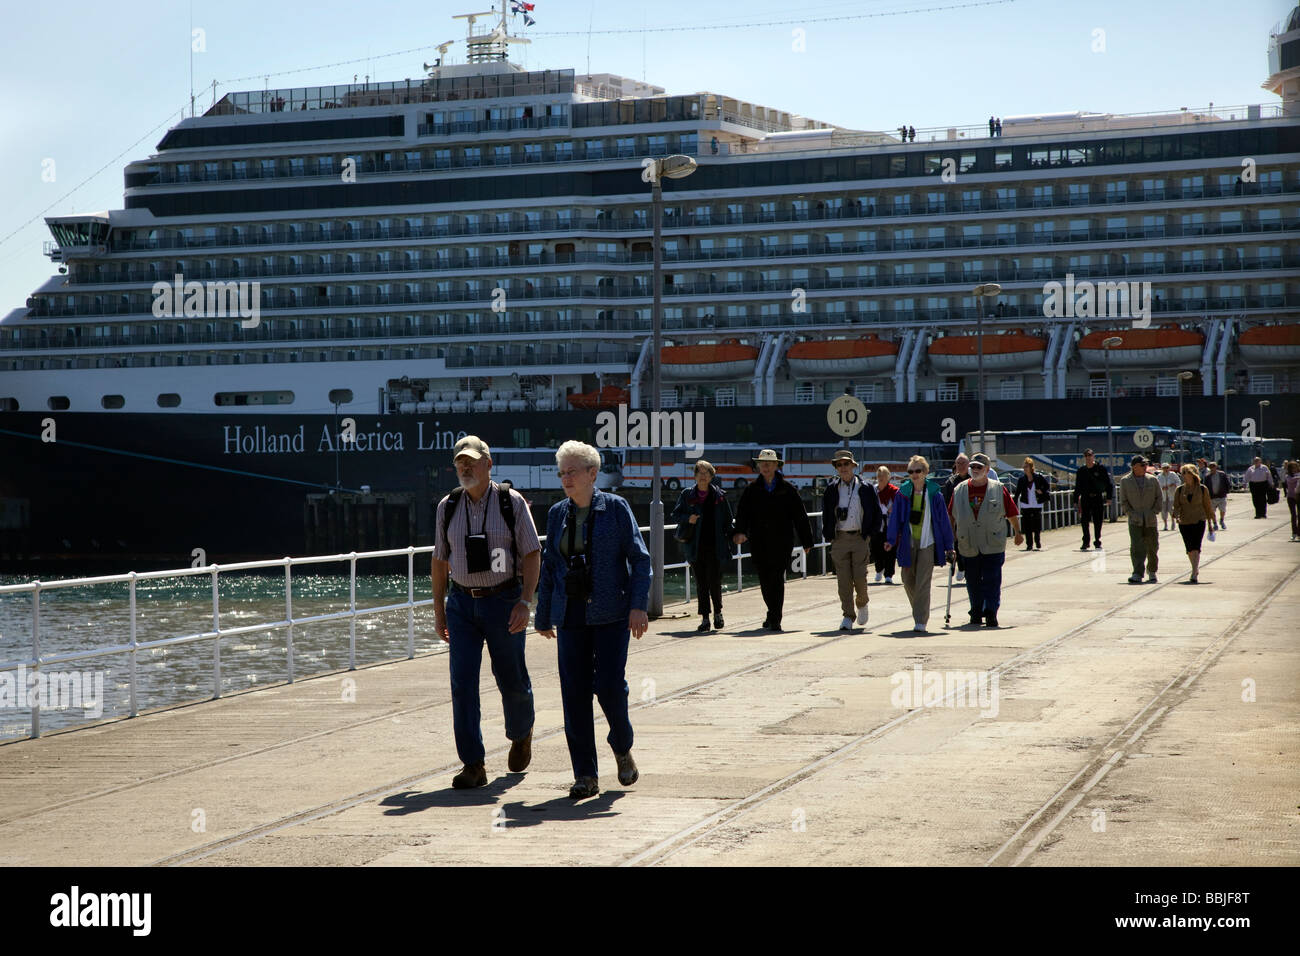 Passengers disembarking  from Eurodam at Invergordon, Cromarty Firth, Scotland, UK - Stock Image